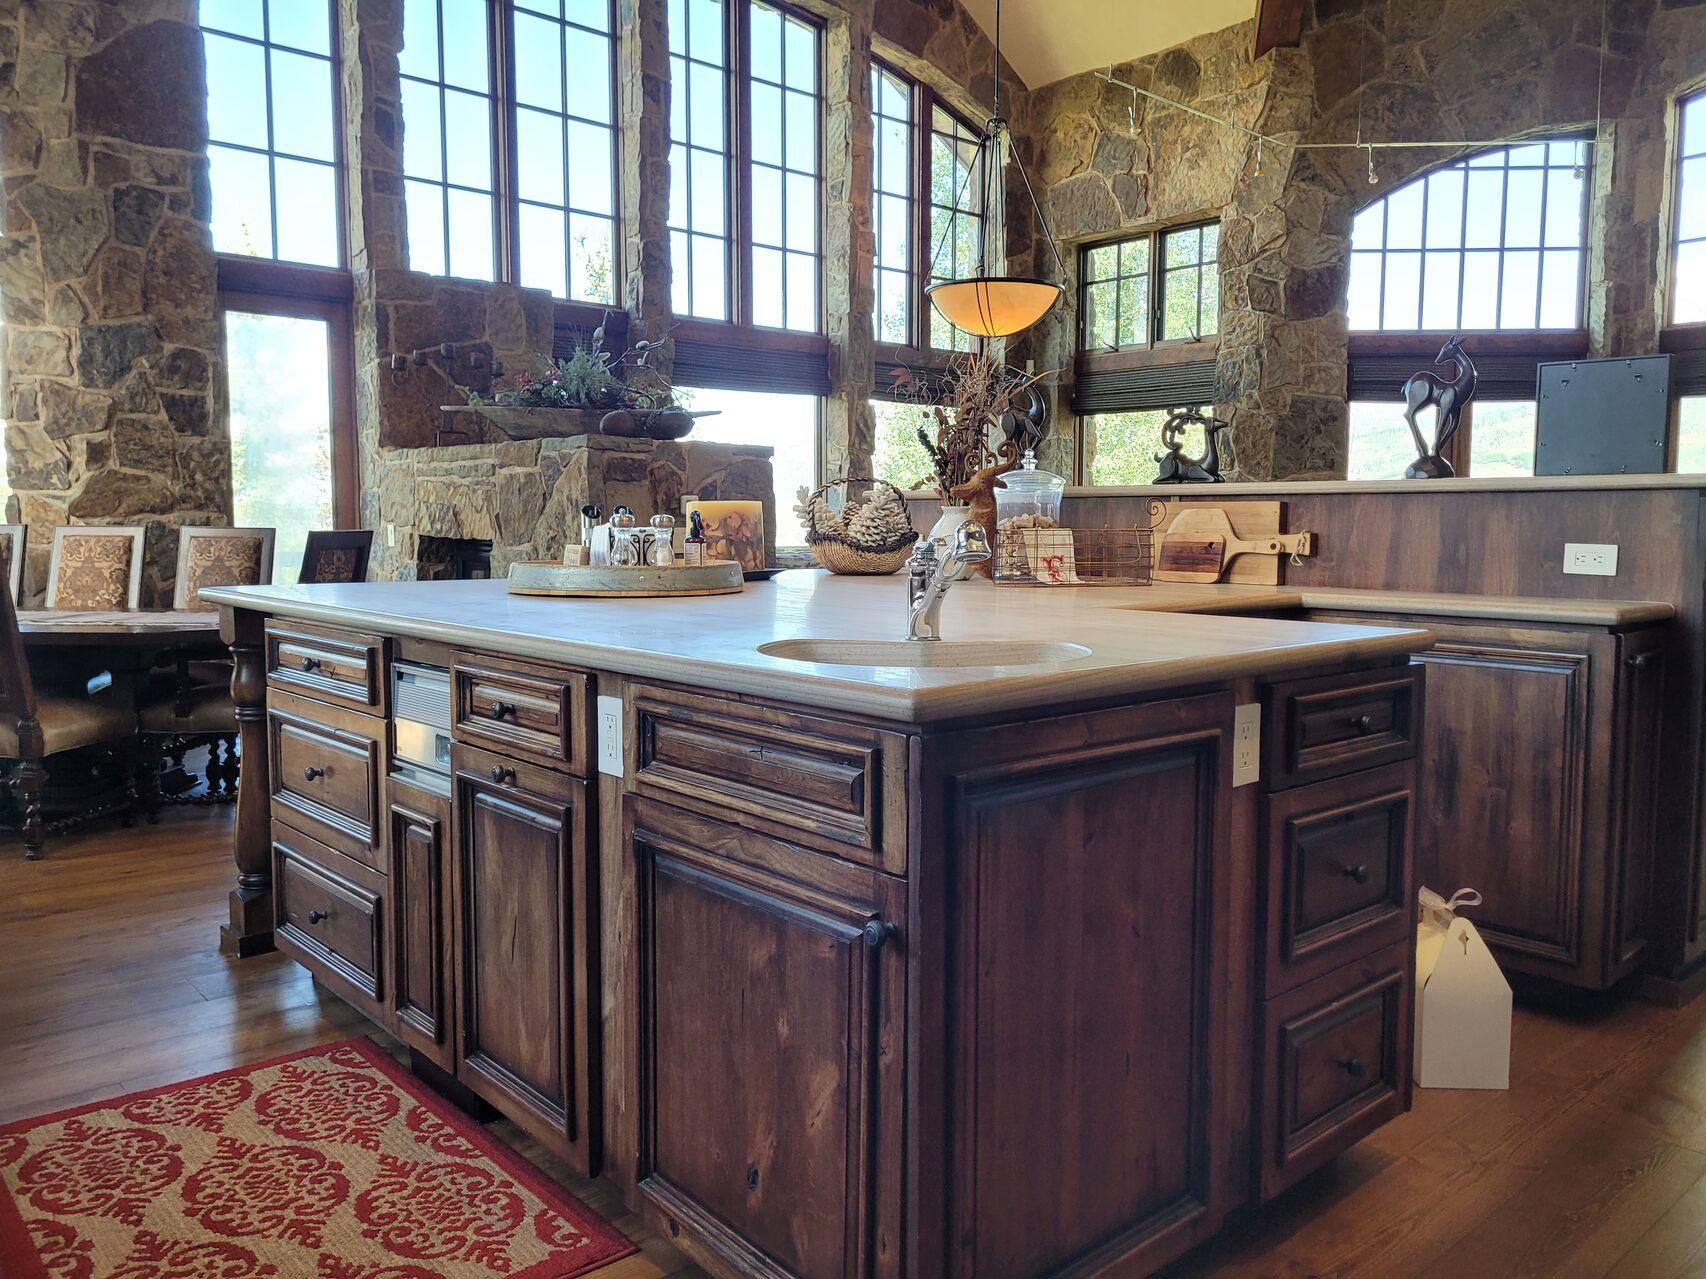 Large kitchen island with dark wood cabinets